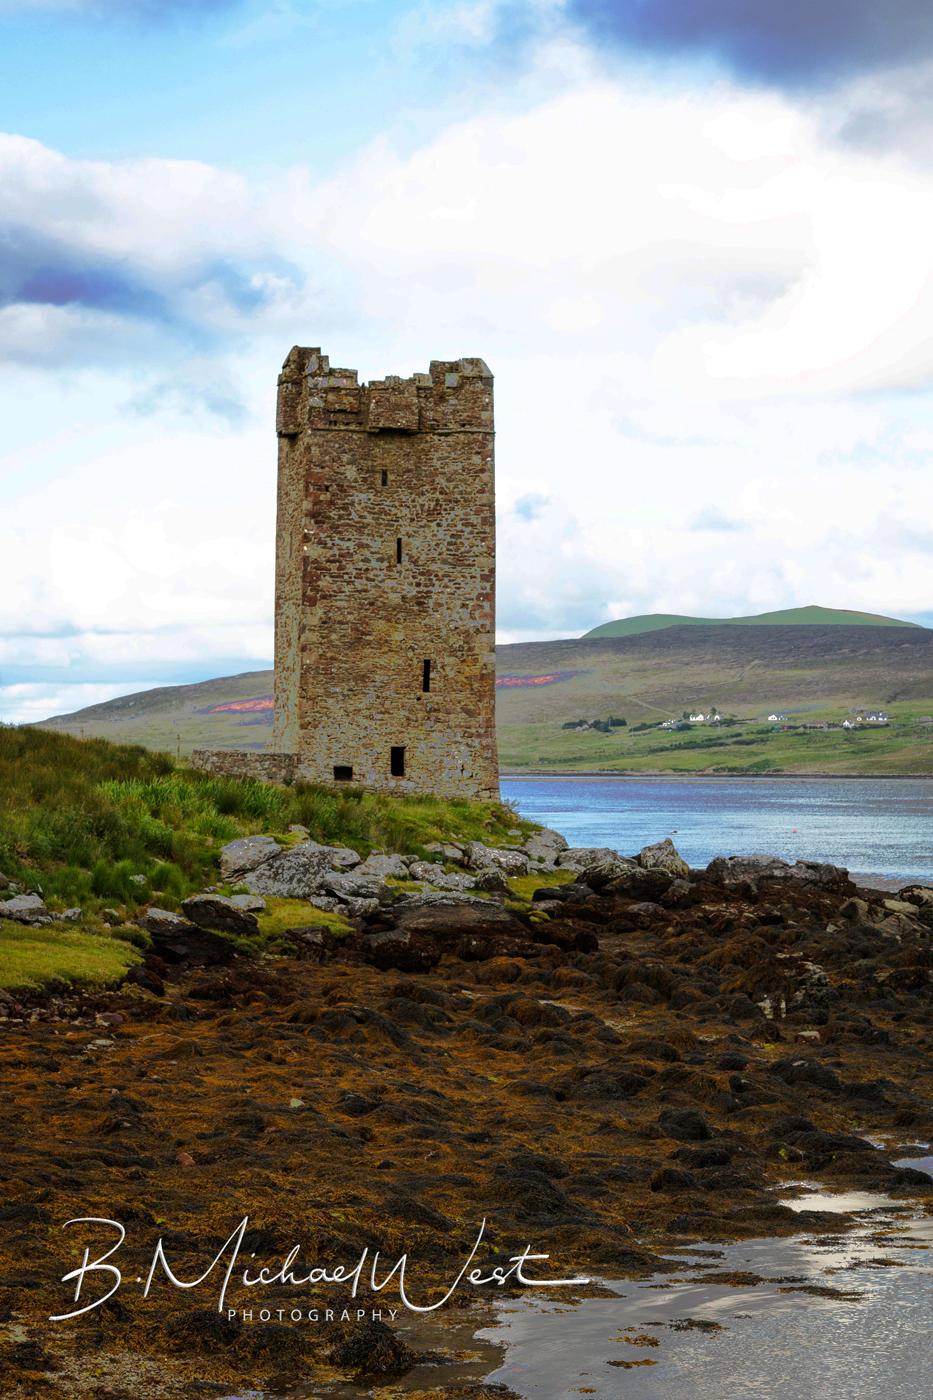 Carrick Kildavnet, Ireland